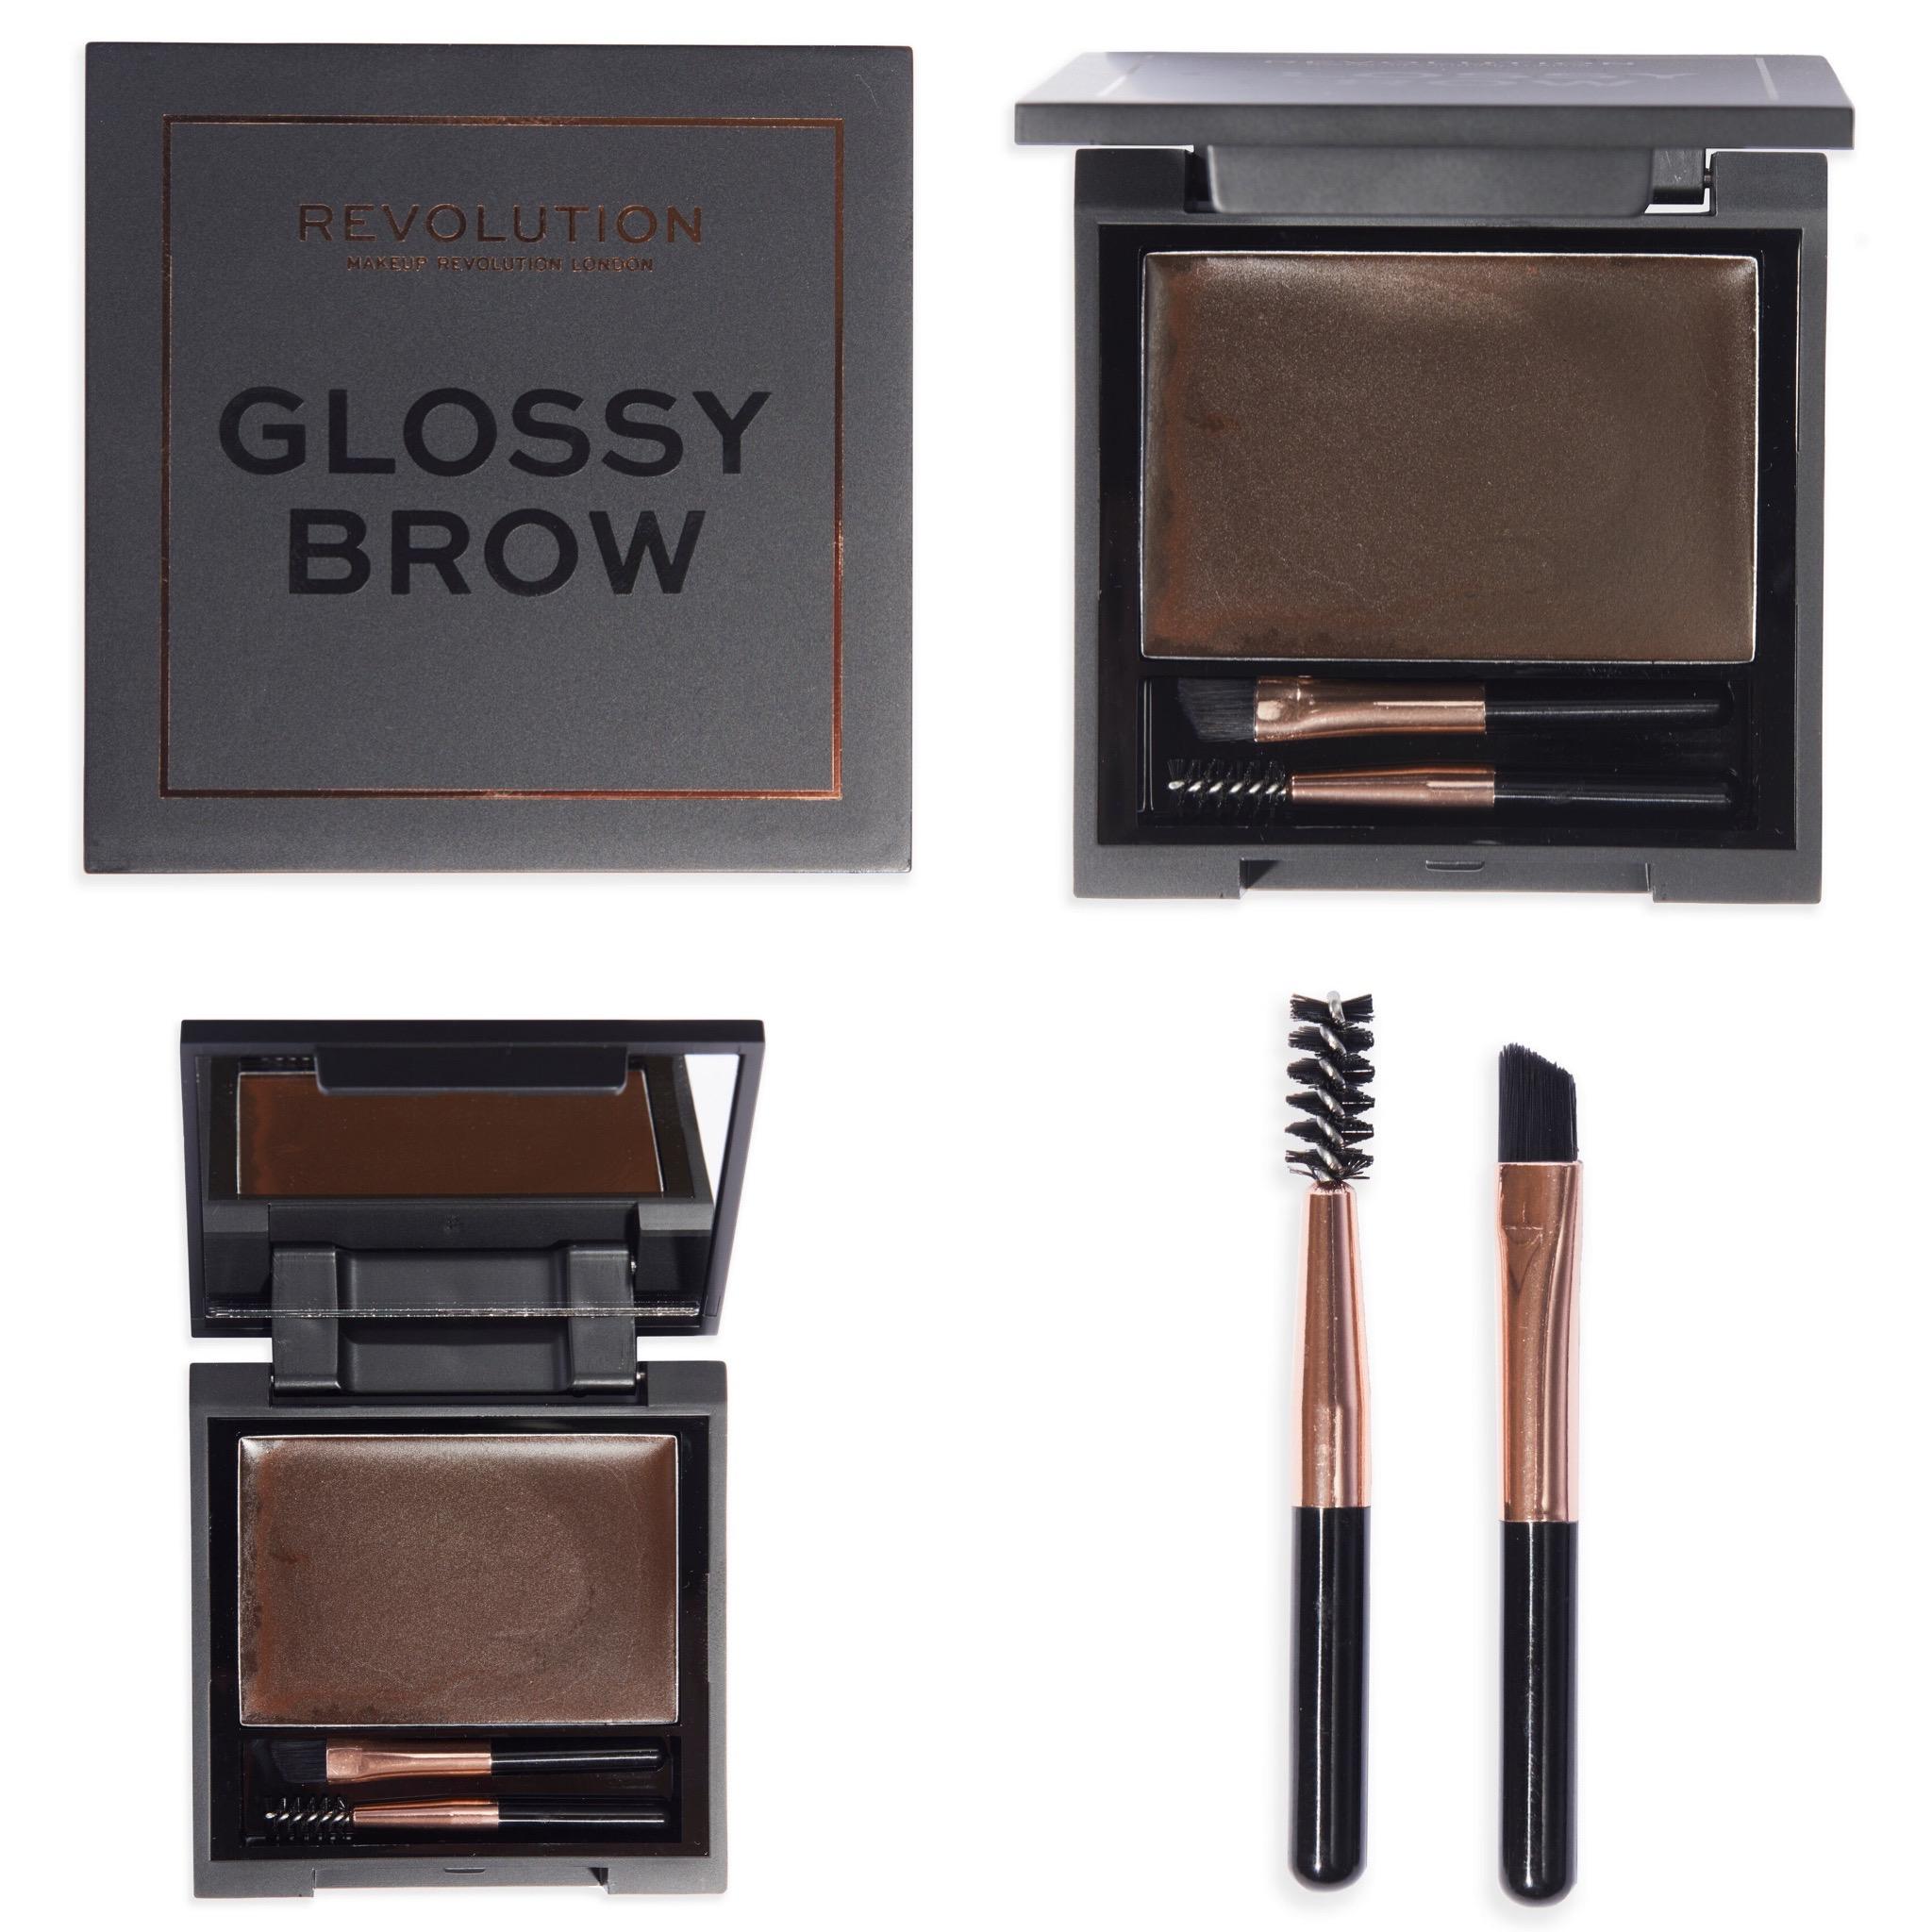 Revolution Glossy Brow Eyebrow Kit